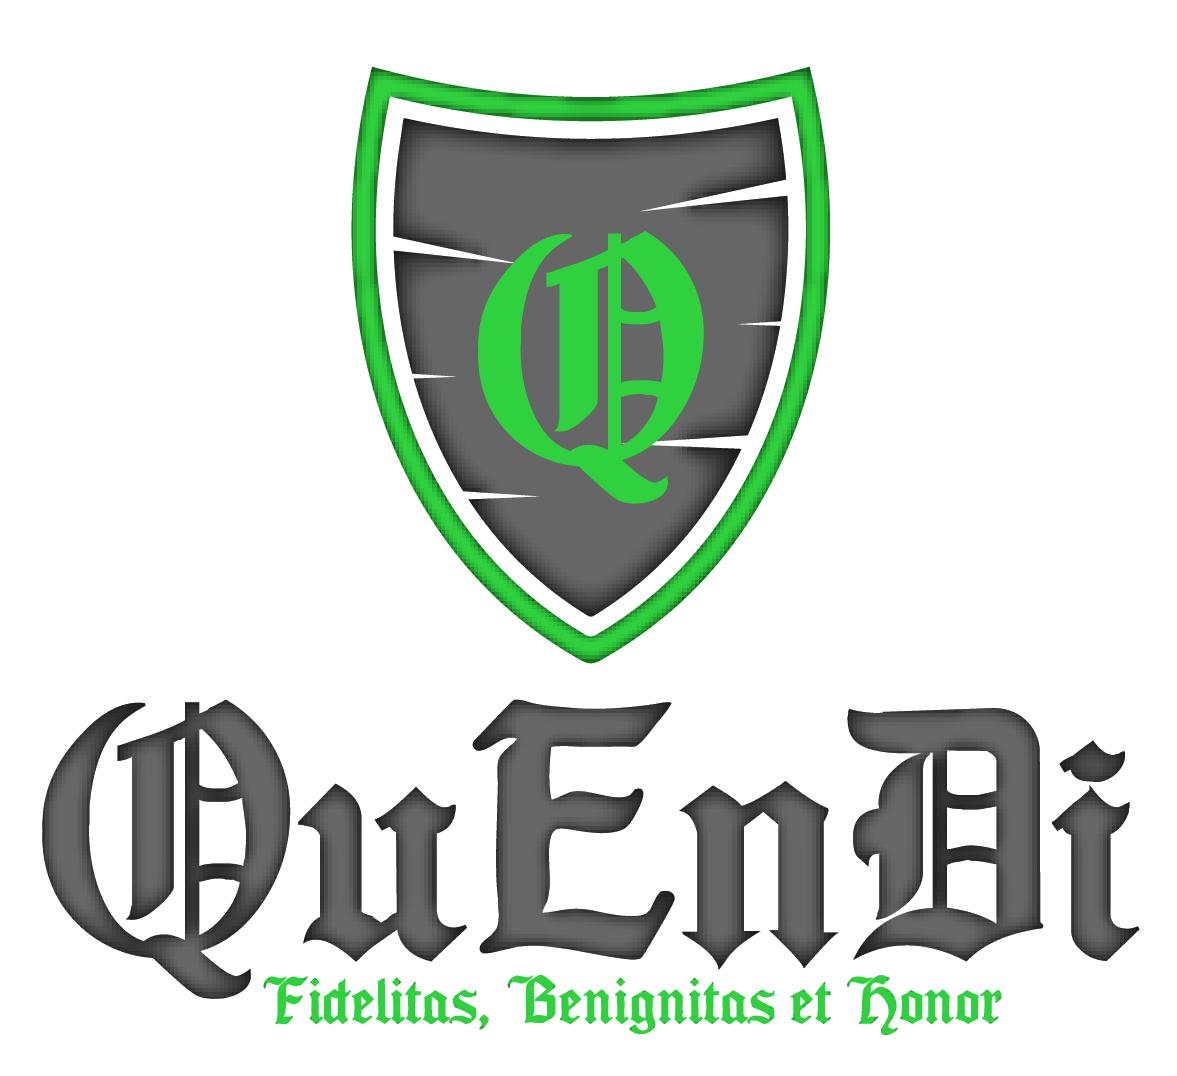 QuEnDi.png